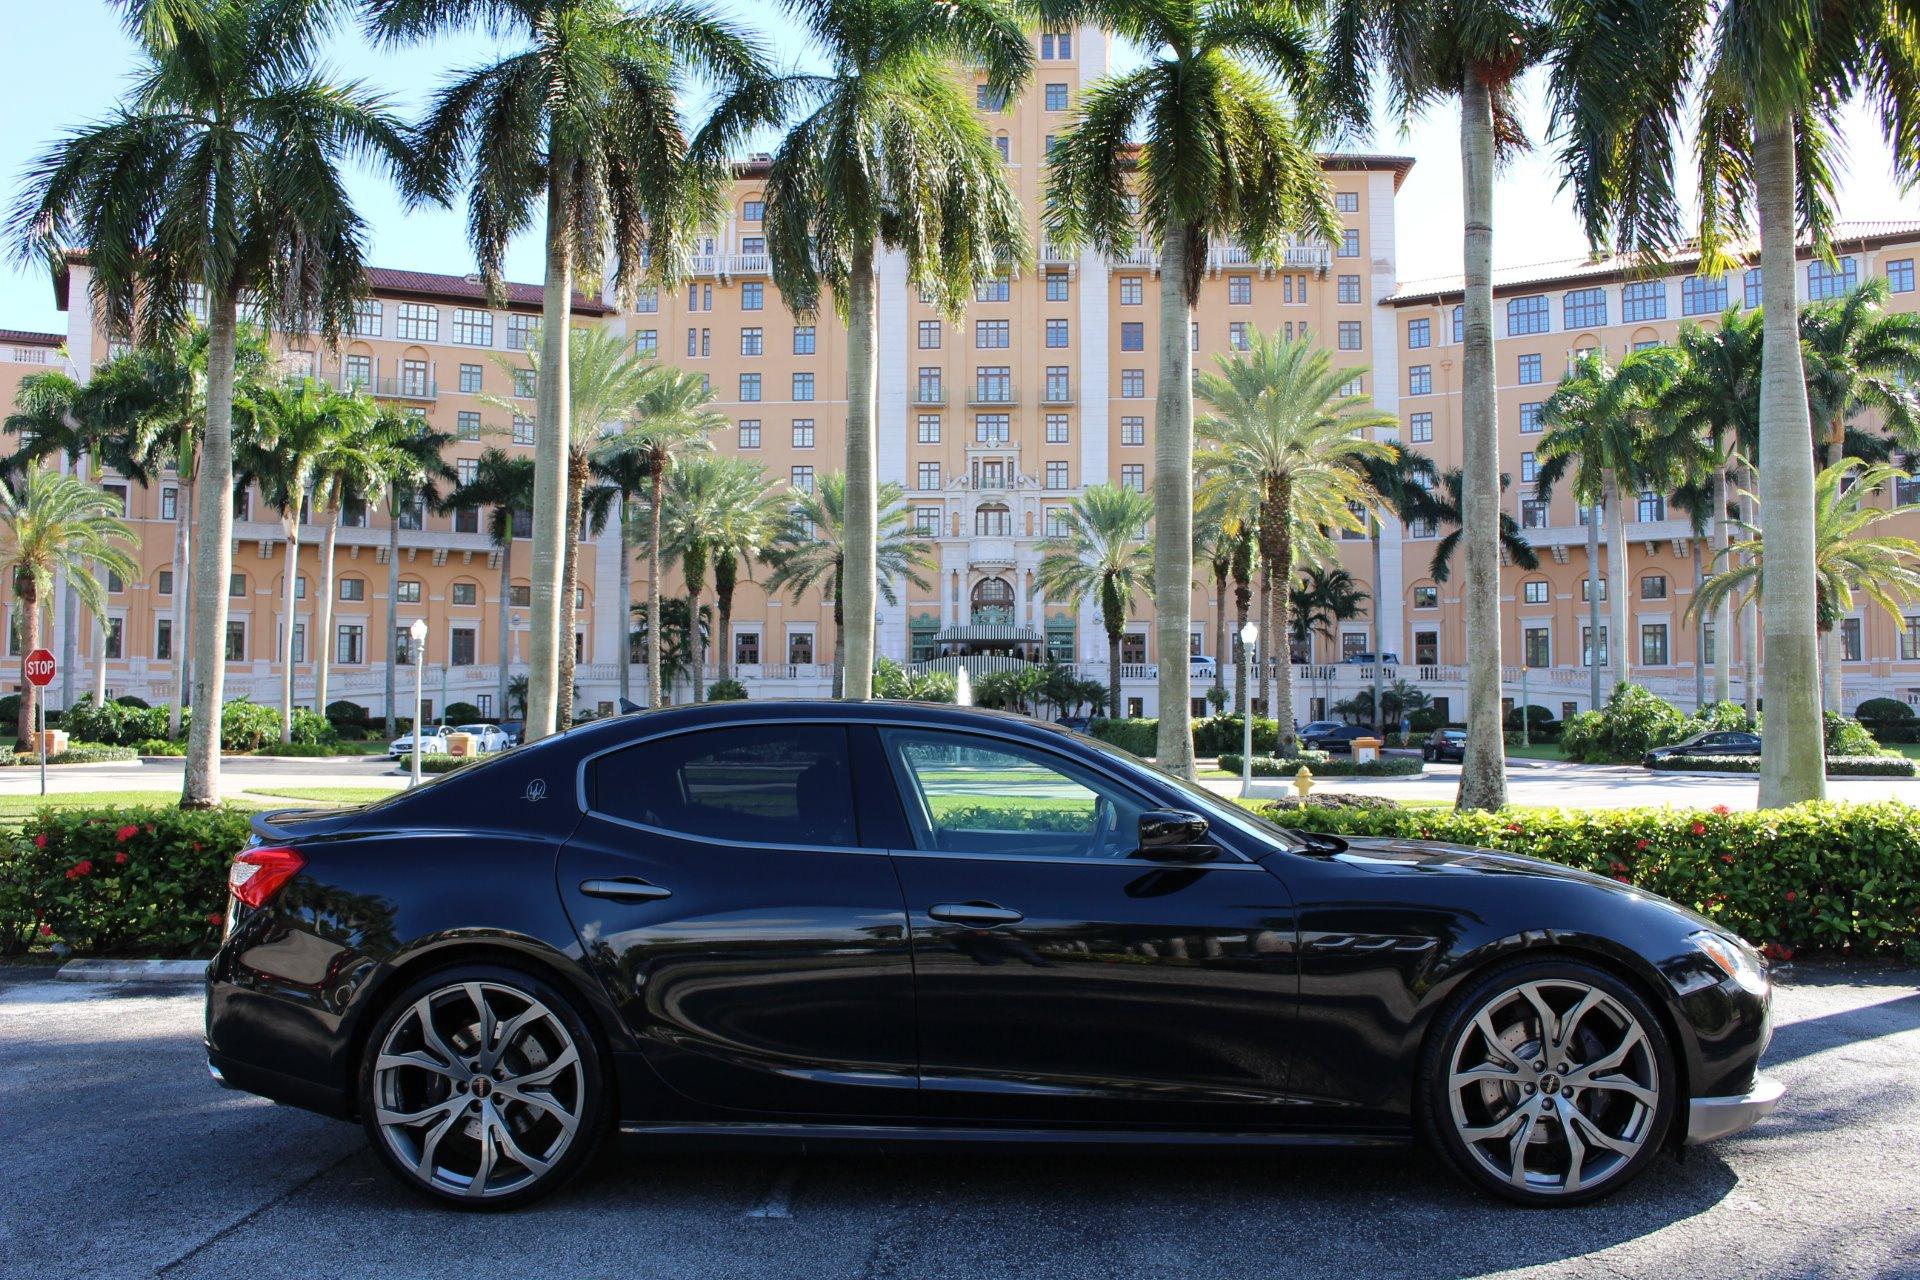 Used 2015 Maserati Ghibli SQ4 Novitec for sale $32,850 at The Gables Sports Cars in Miami FL 33146 1